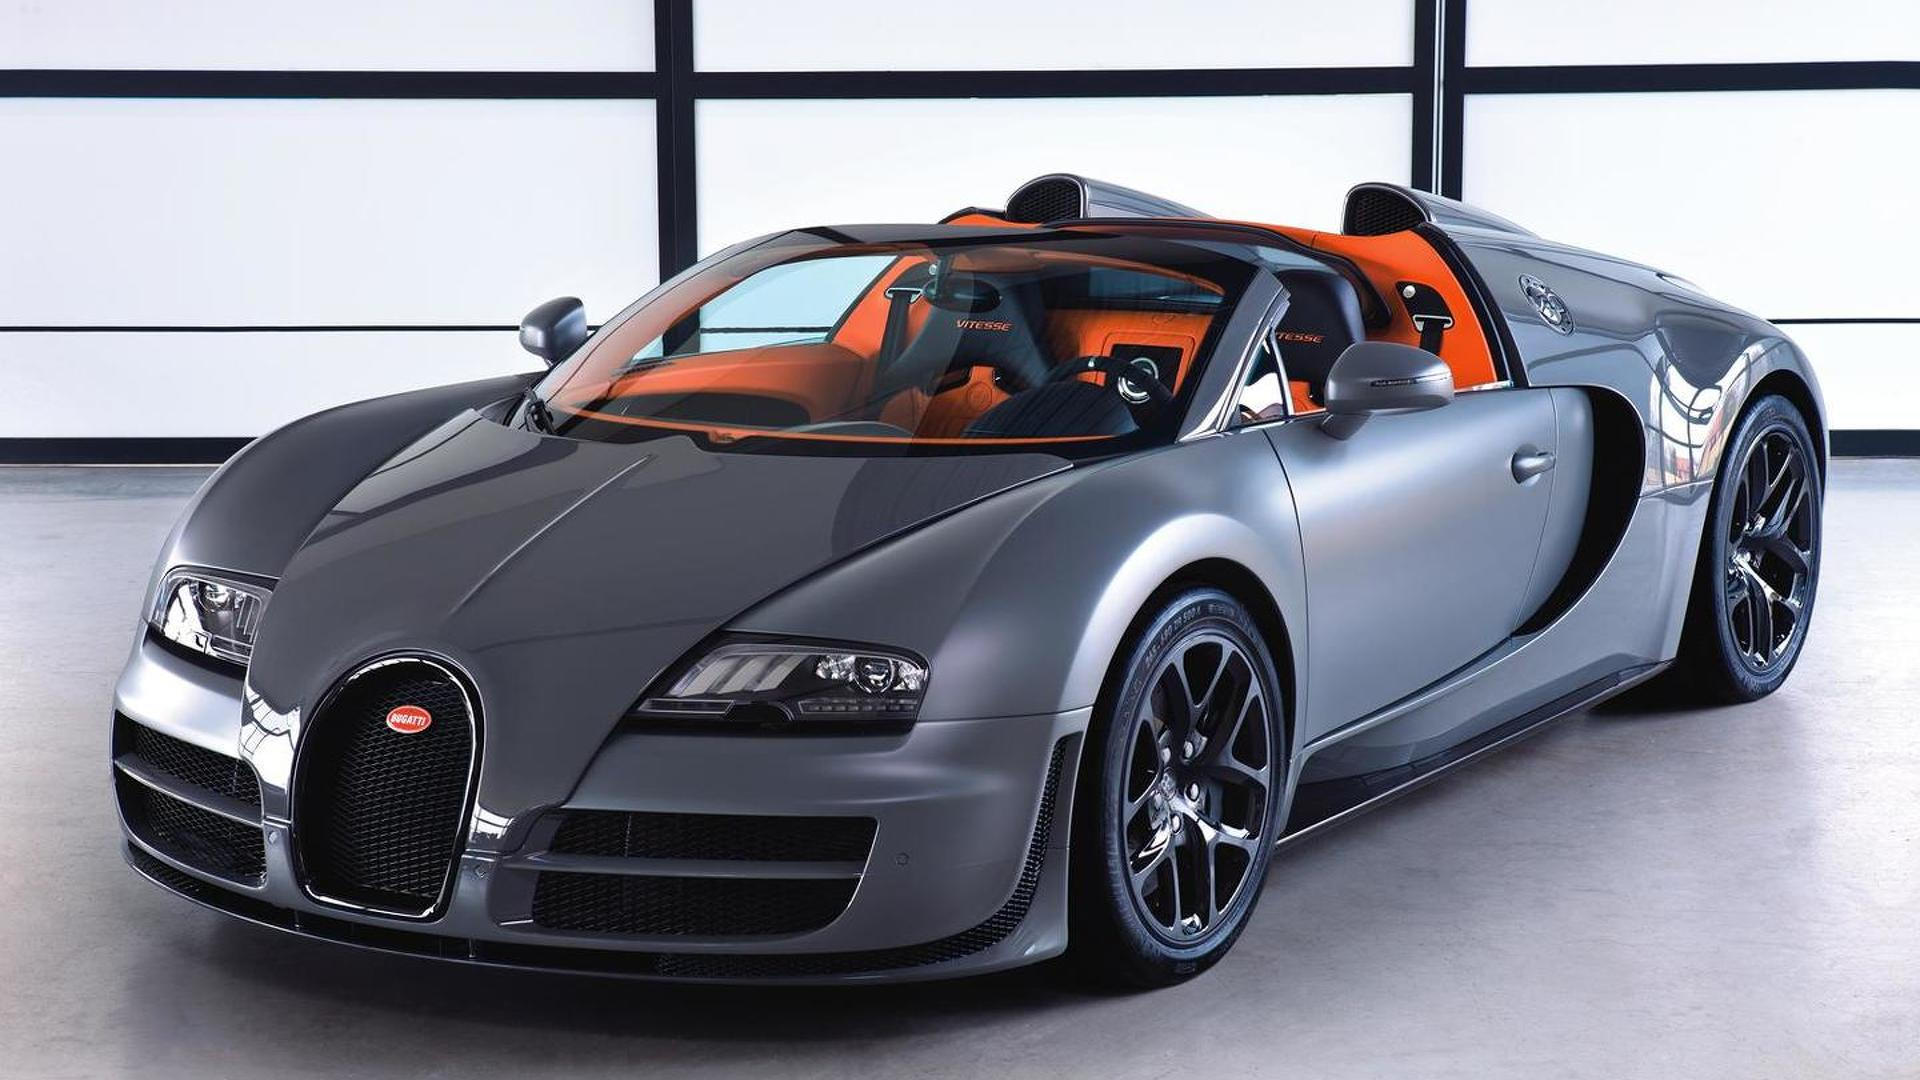 2012-303667-bugatti-veyron-grand-sport-vitesse1 Fabulous 2012 Bugatti Veyron Grand Sport Vitesse Specs Cars Trend